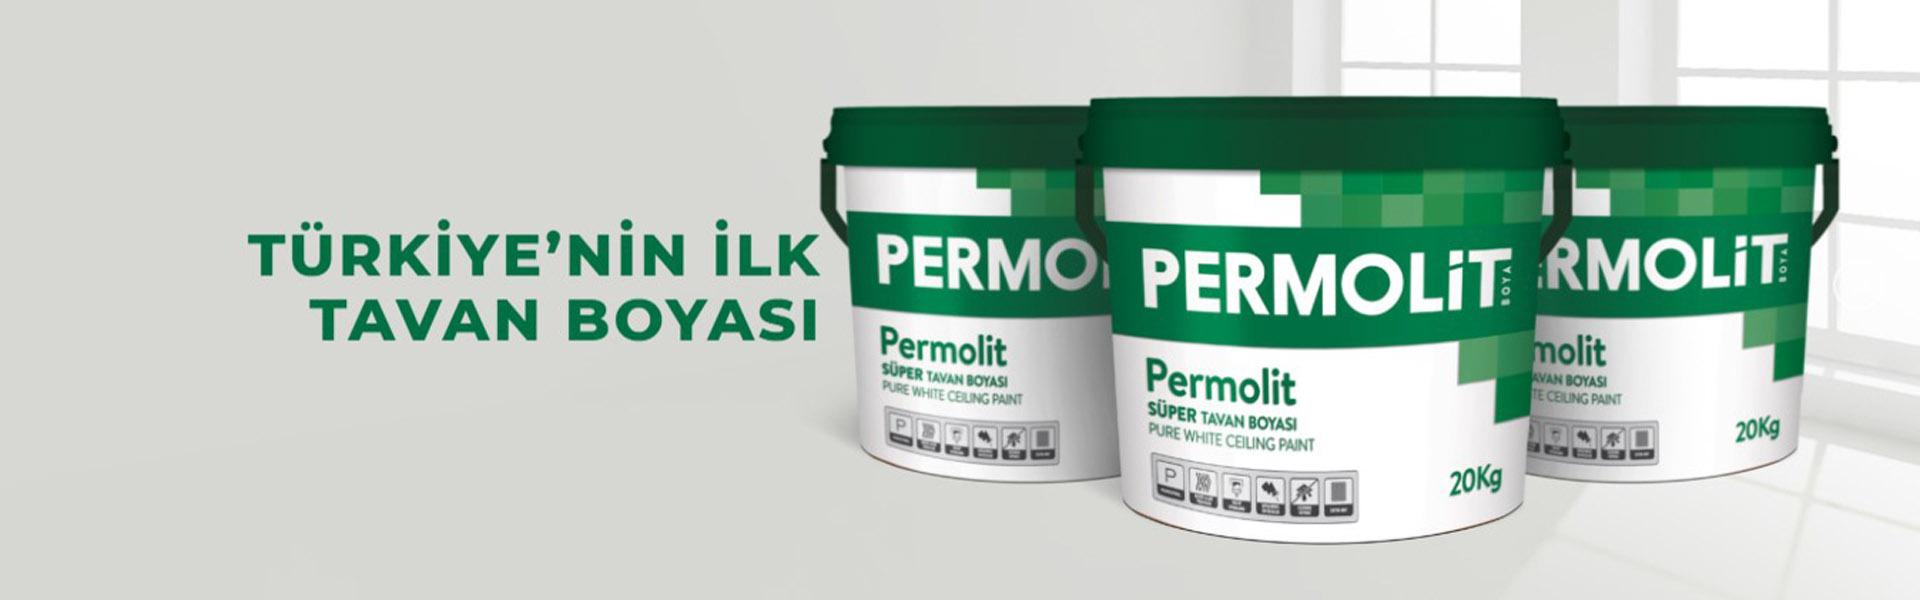 permolit-slide1